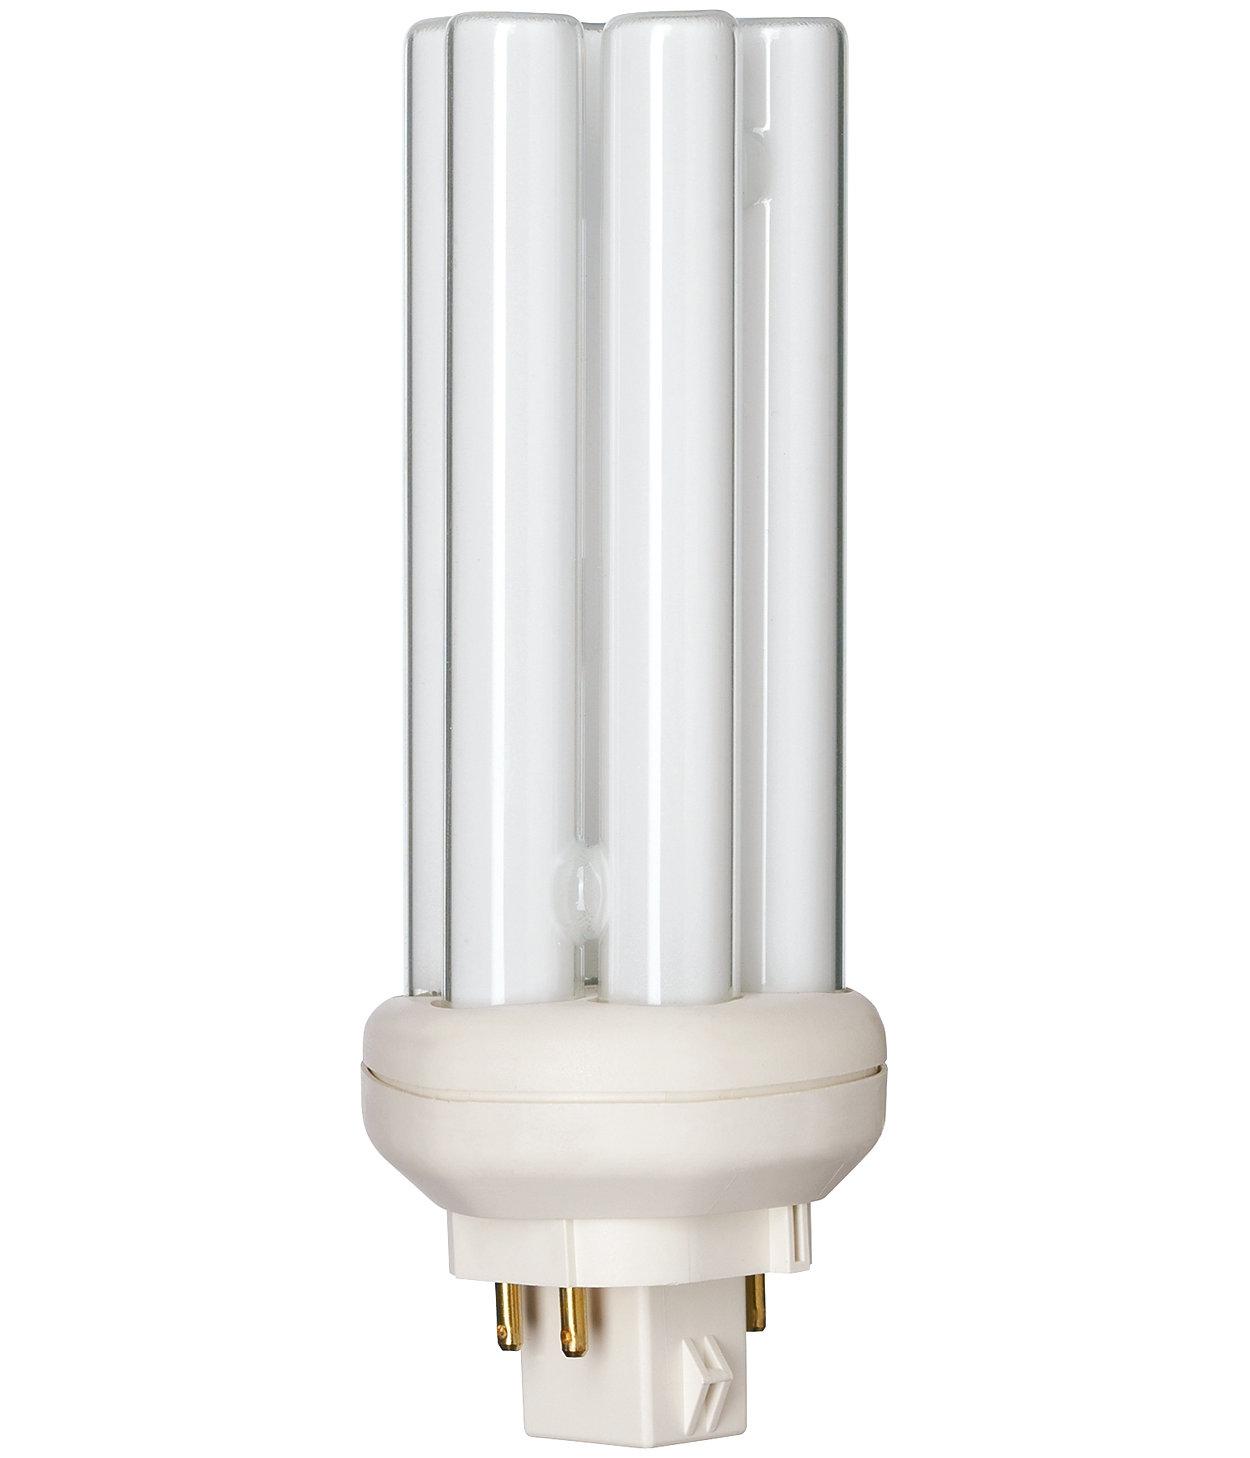 Energy savings made simple.